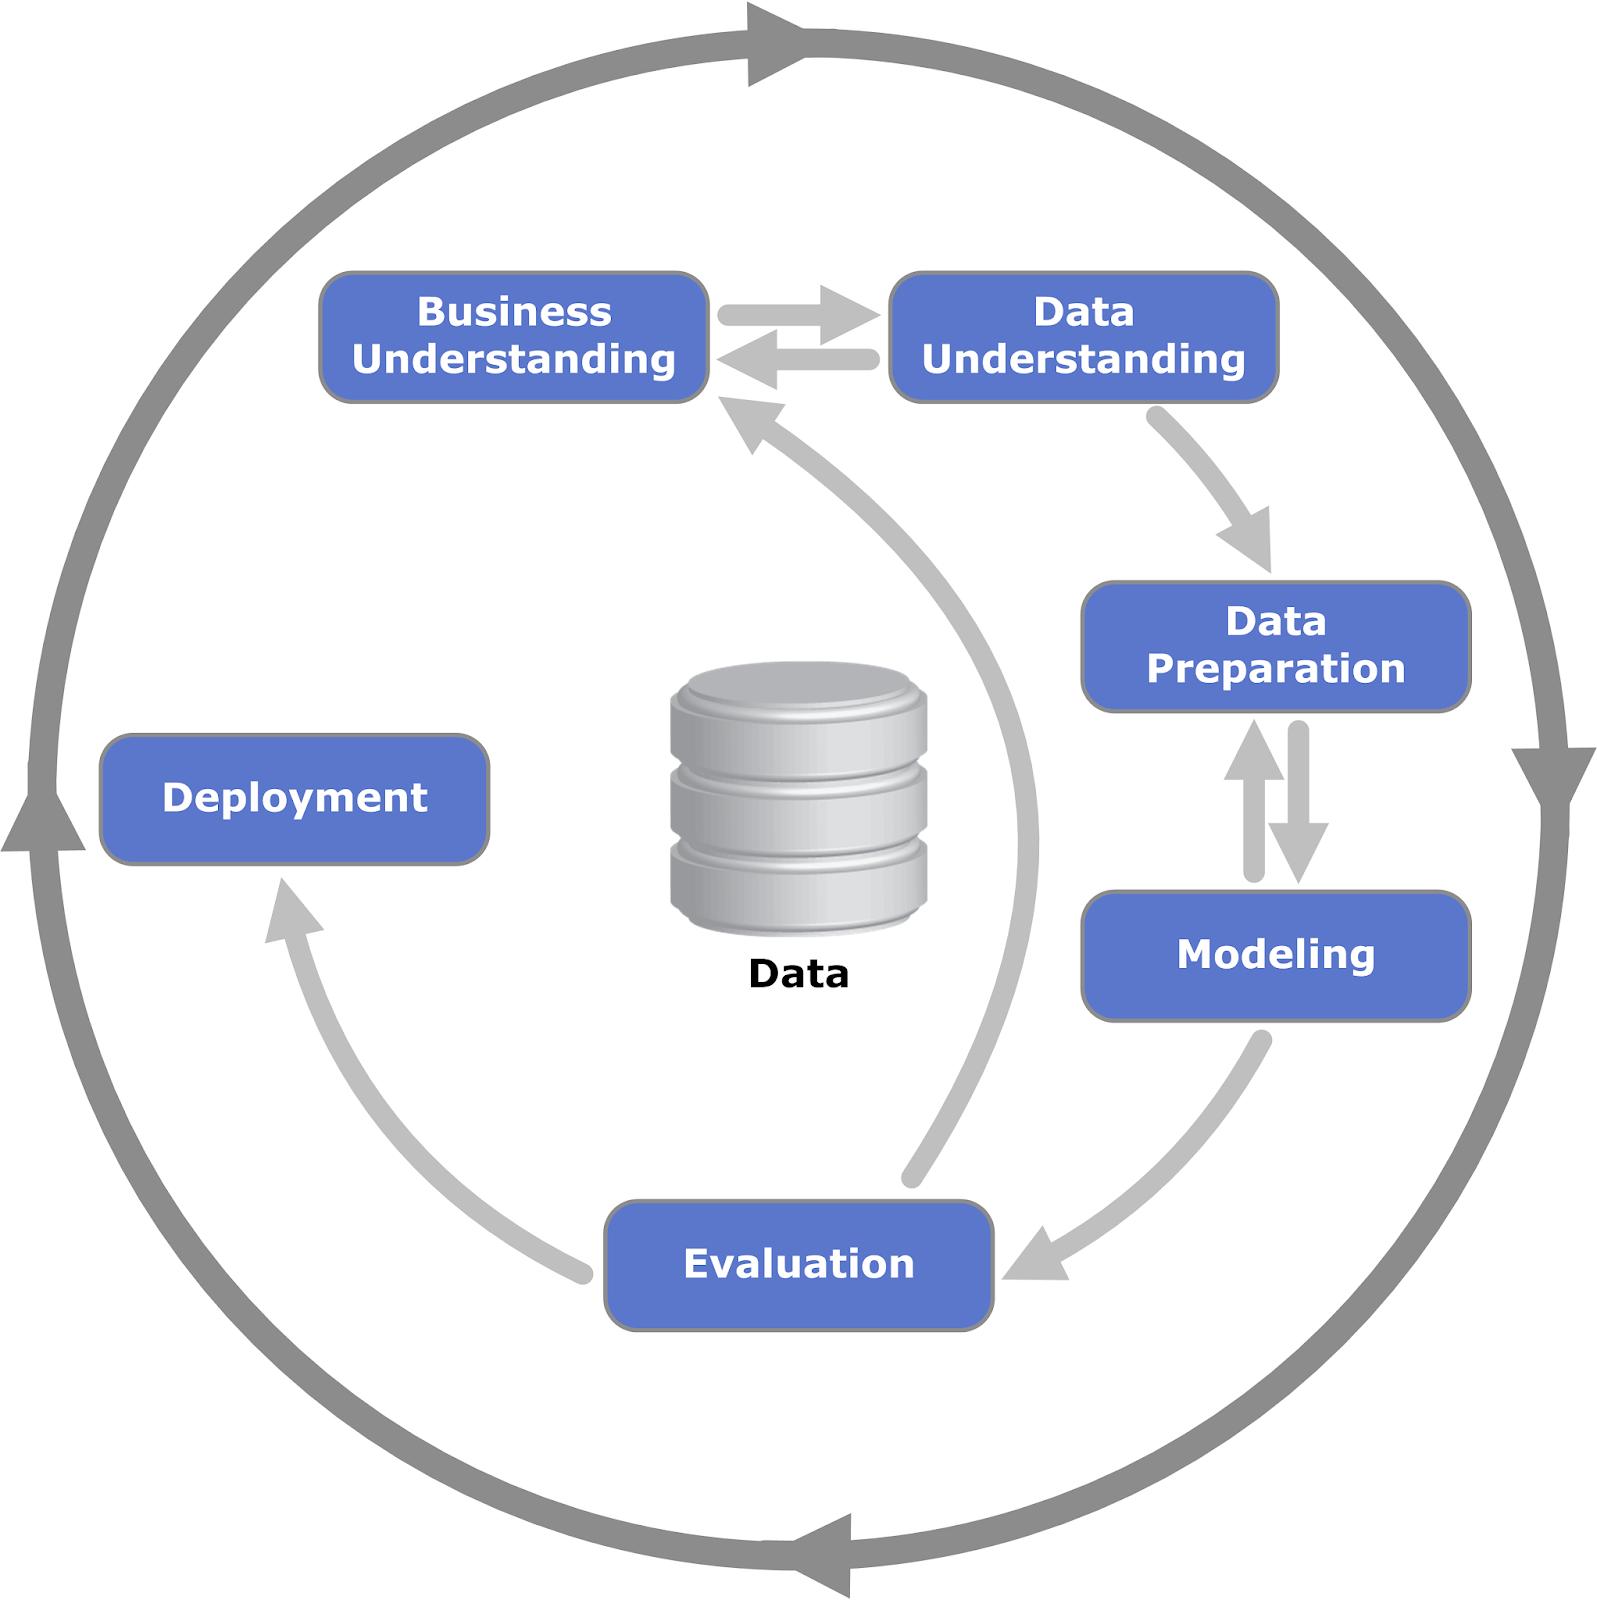 CRISP-DM process: AutoML Tools for Python